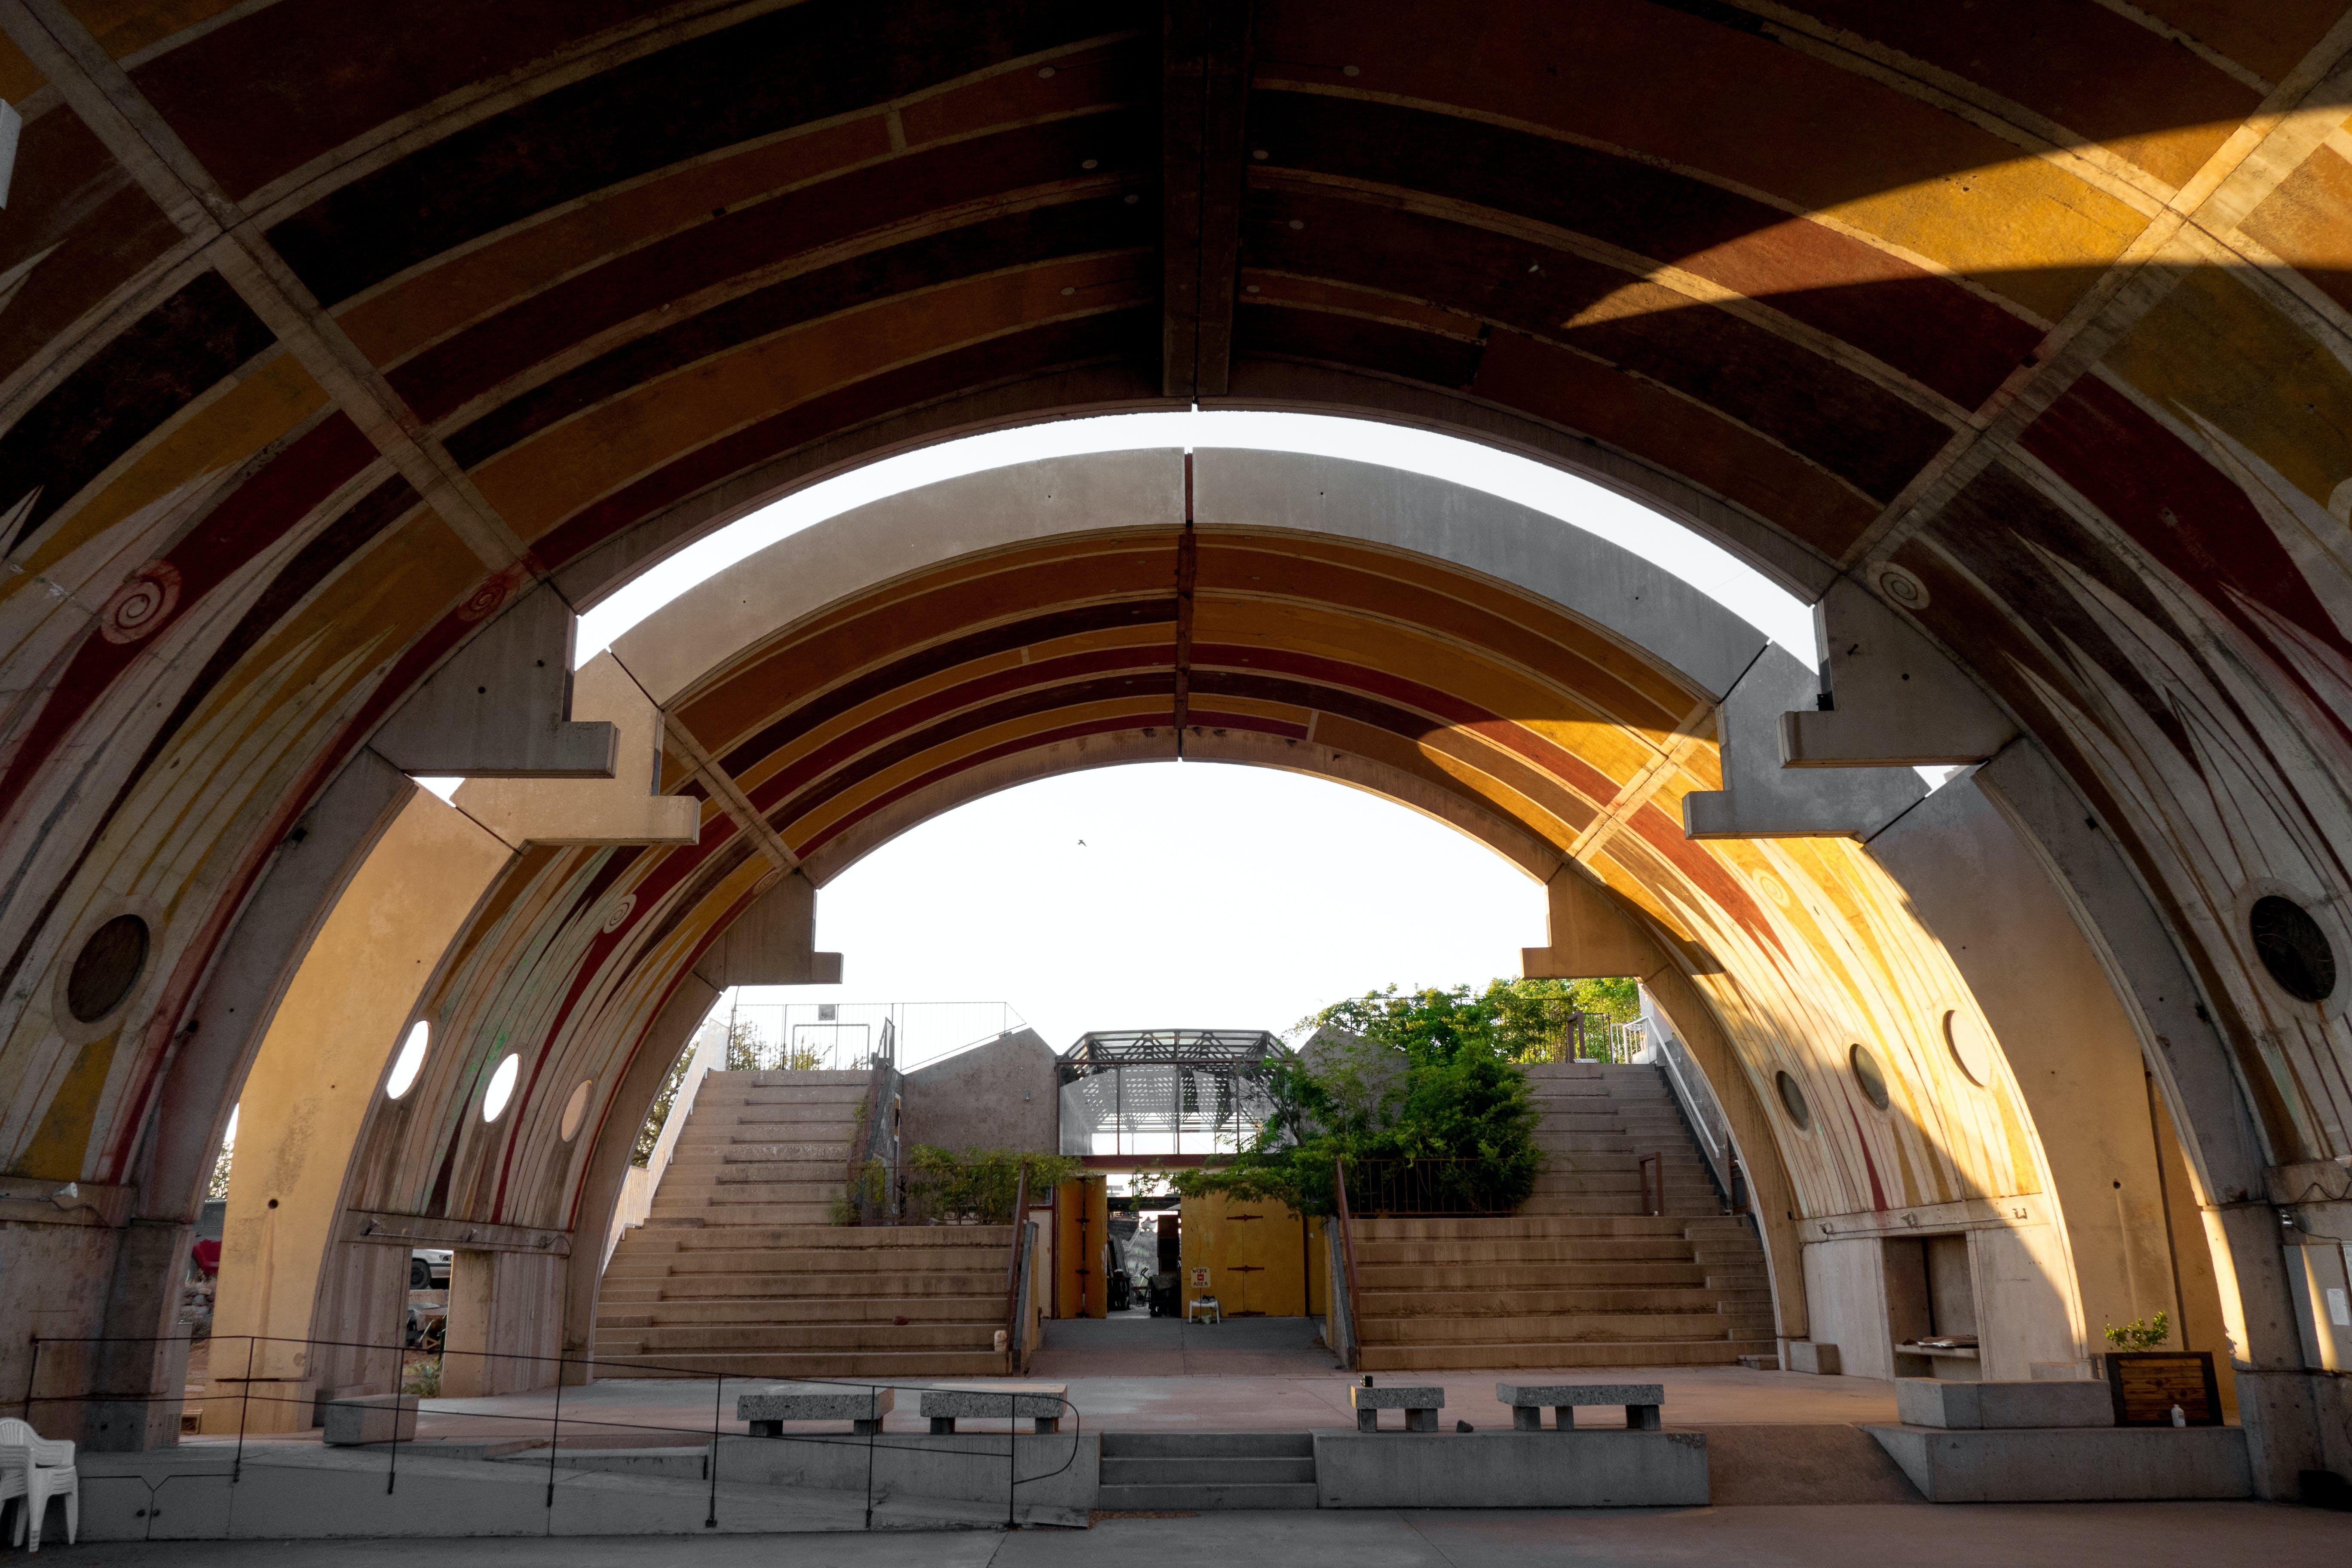 Free stock photo of architecture, atrium, dome